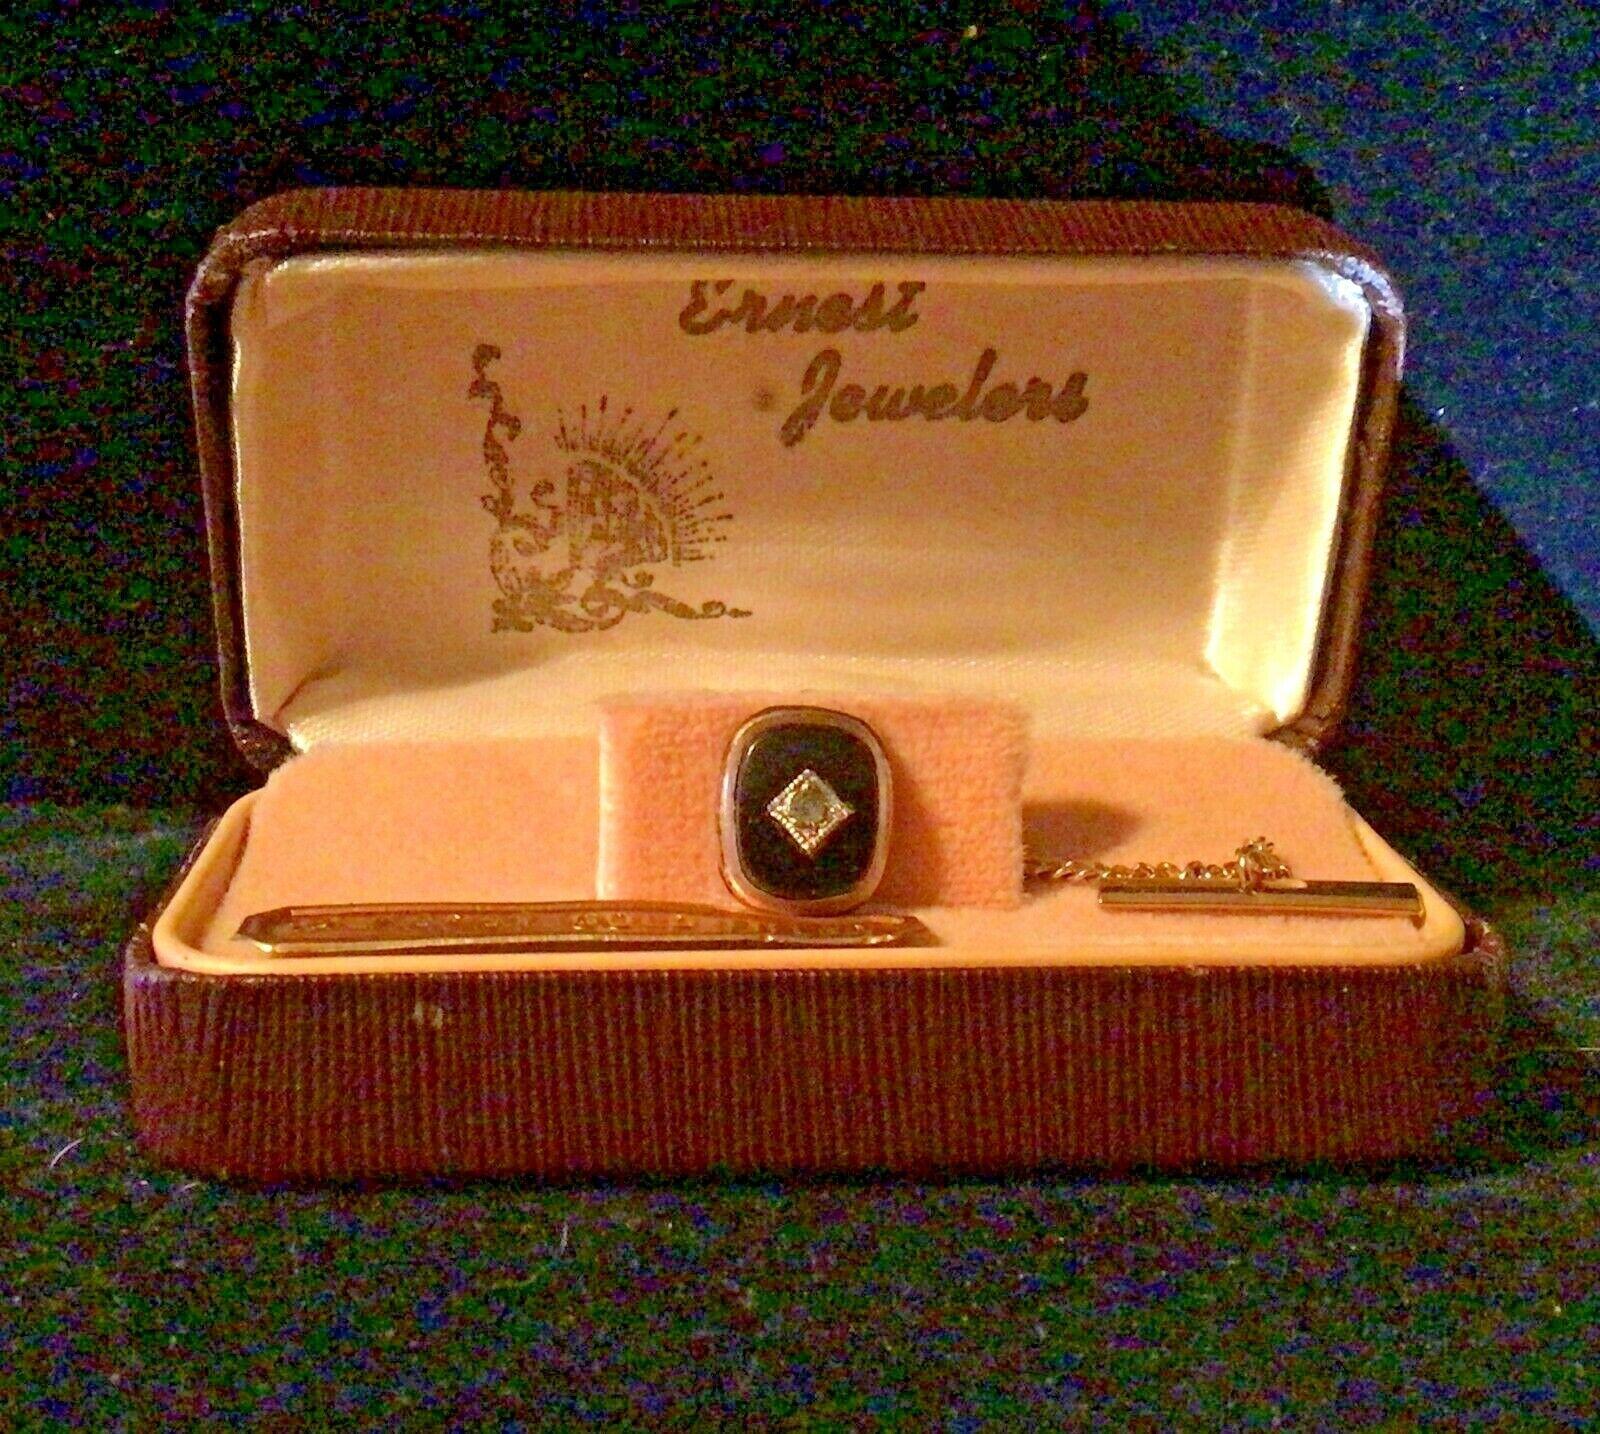 Dolan Bullock Oval Gemstone Pin Vintage D-B 14K Opal and Onyx Tie Tack